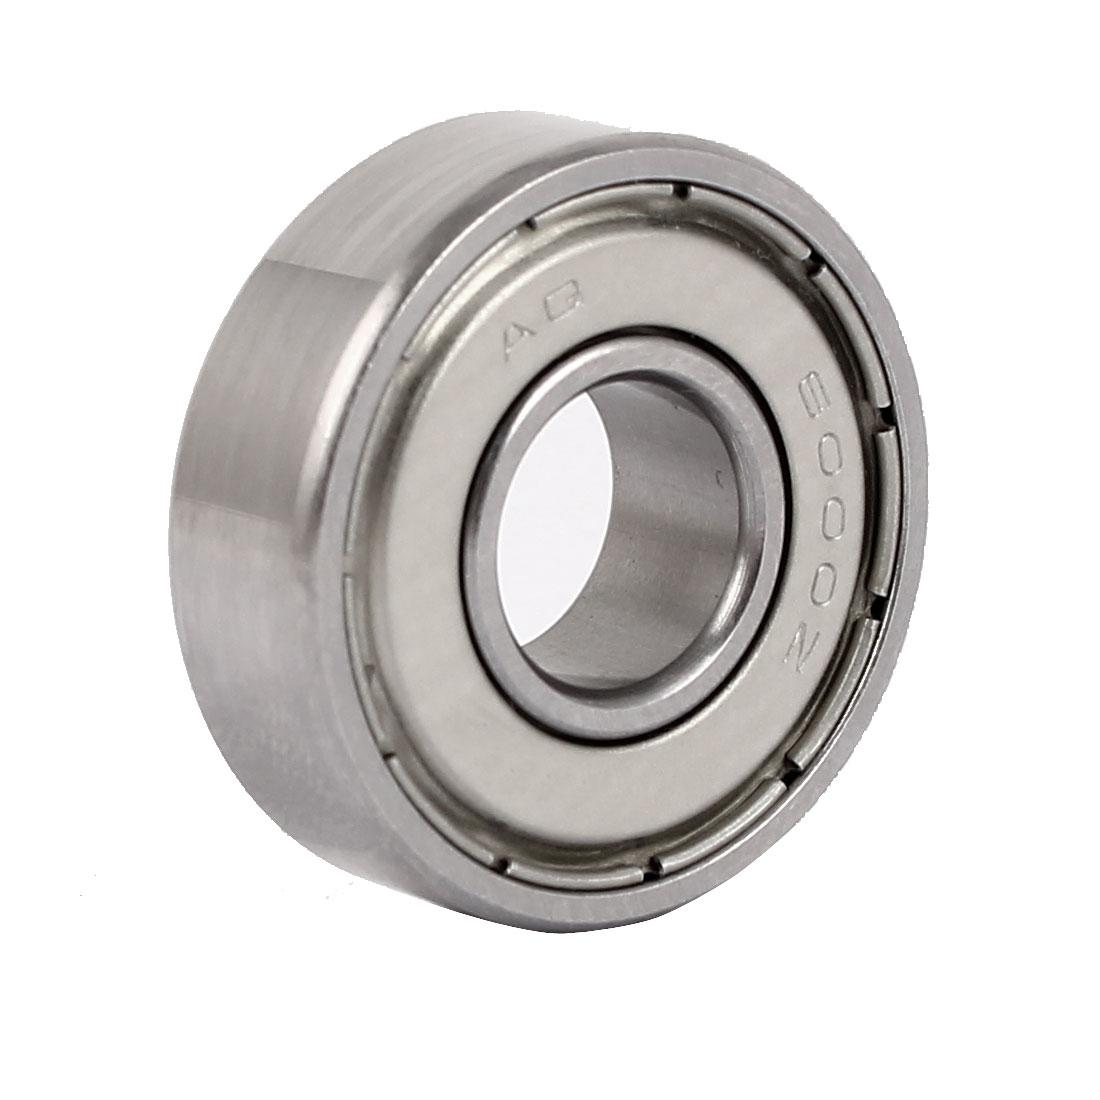 ZZ6000 26mmx10mmx8mm Single Row Deep Groove Shielded Ball Bearing